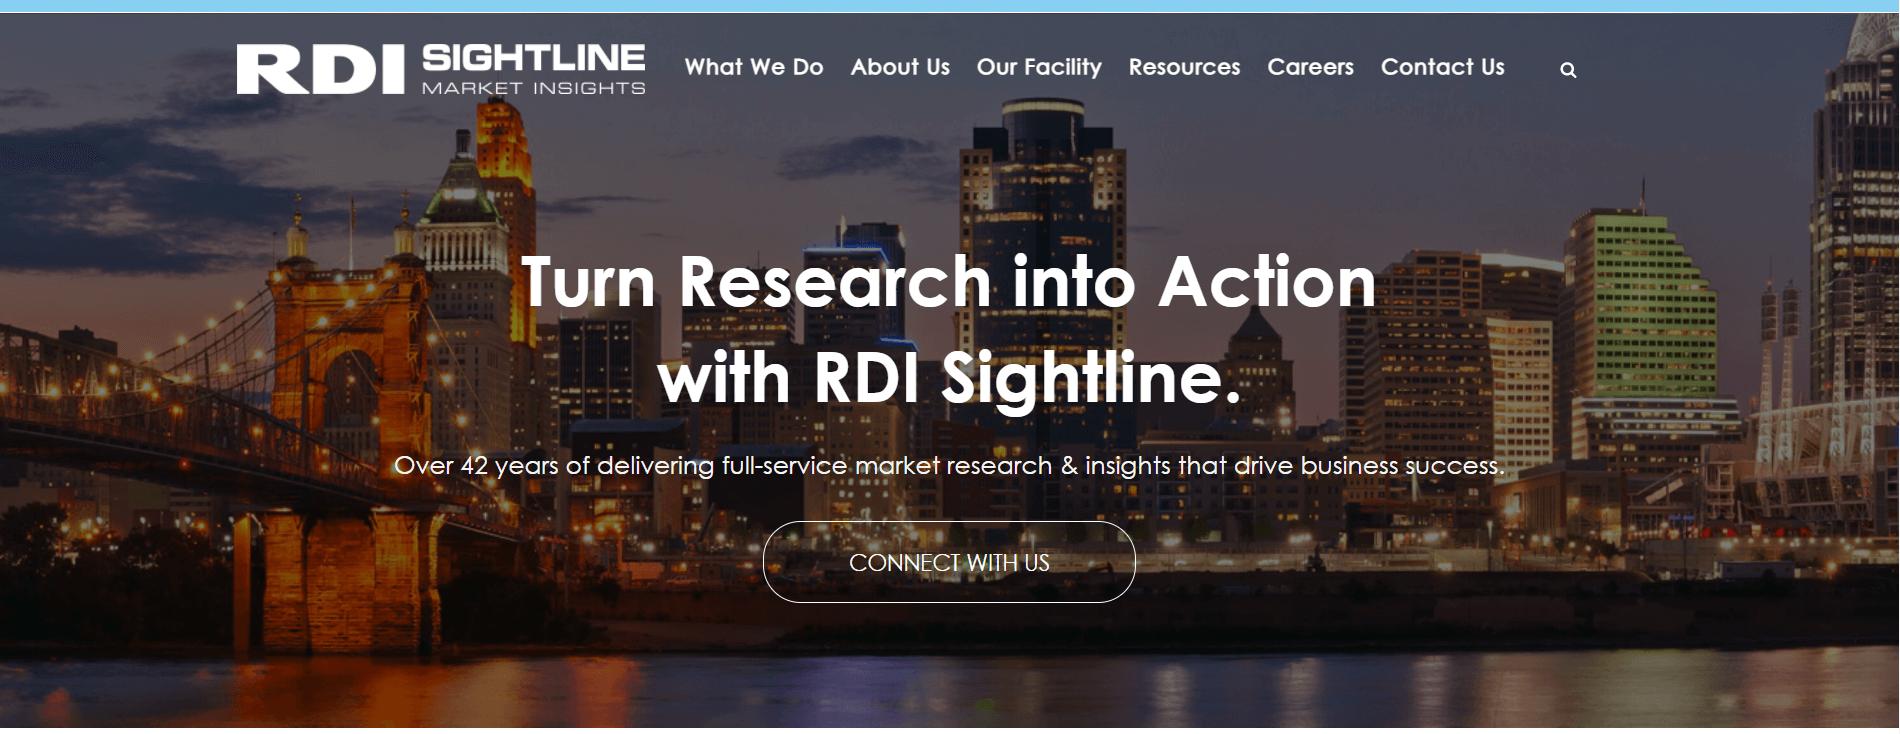 RDI sightline home page